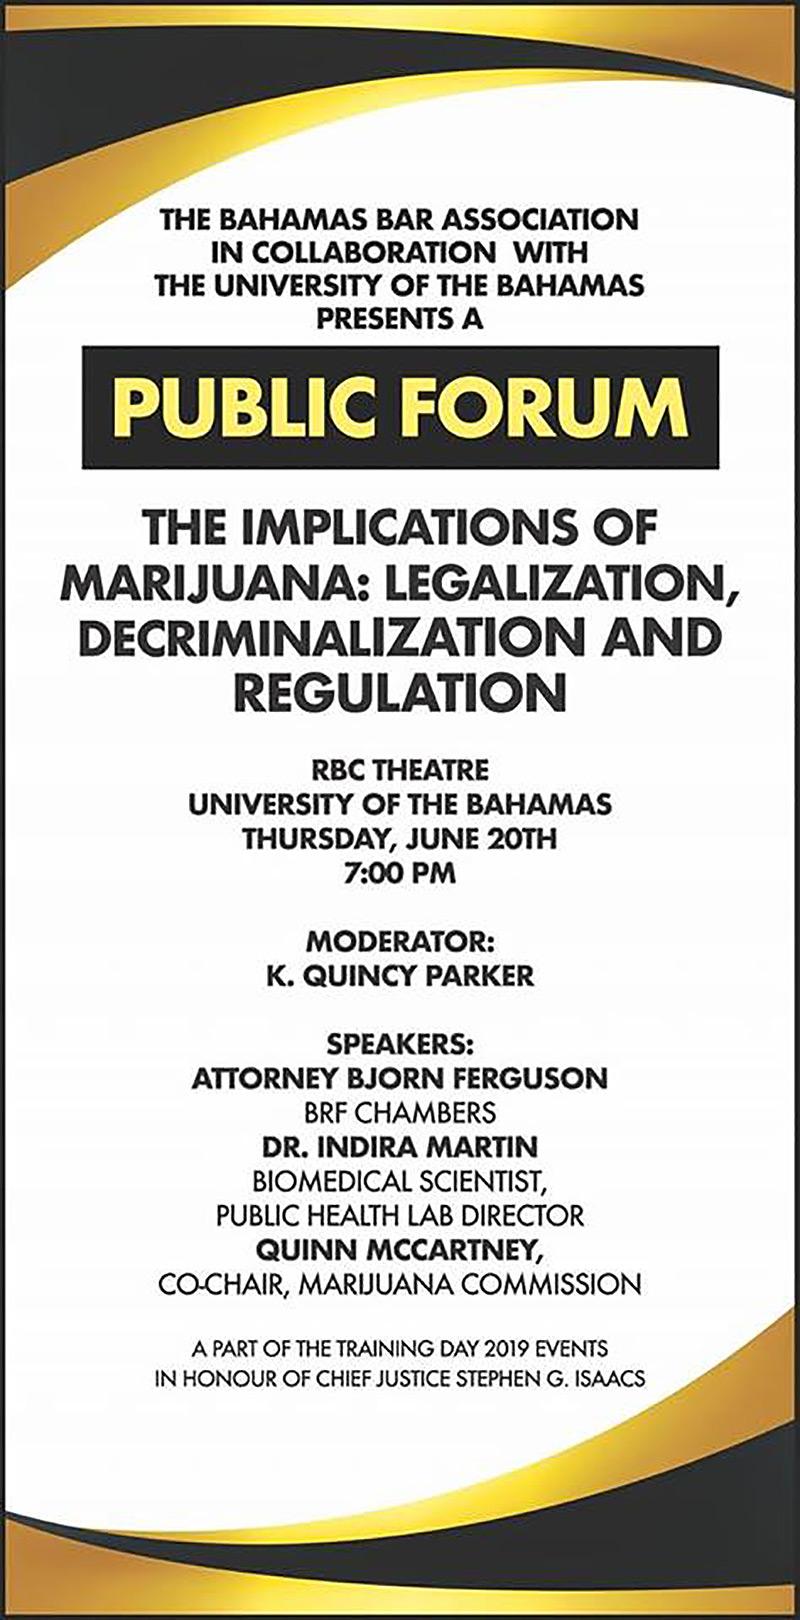 Implications Of Marijuana: Legalization, Decriminalization And Regulation